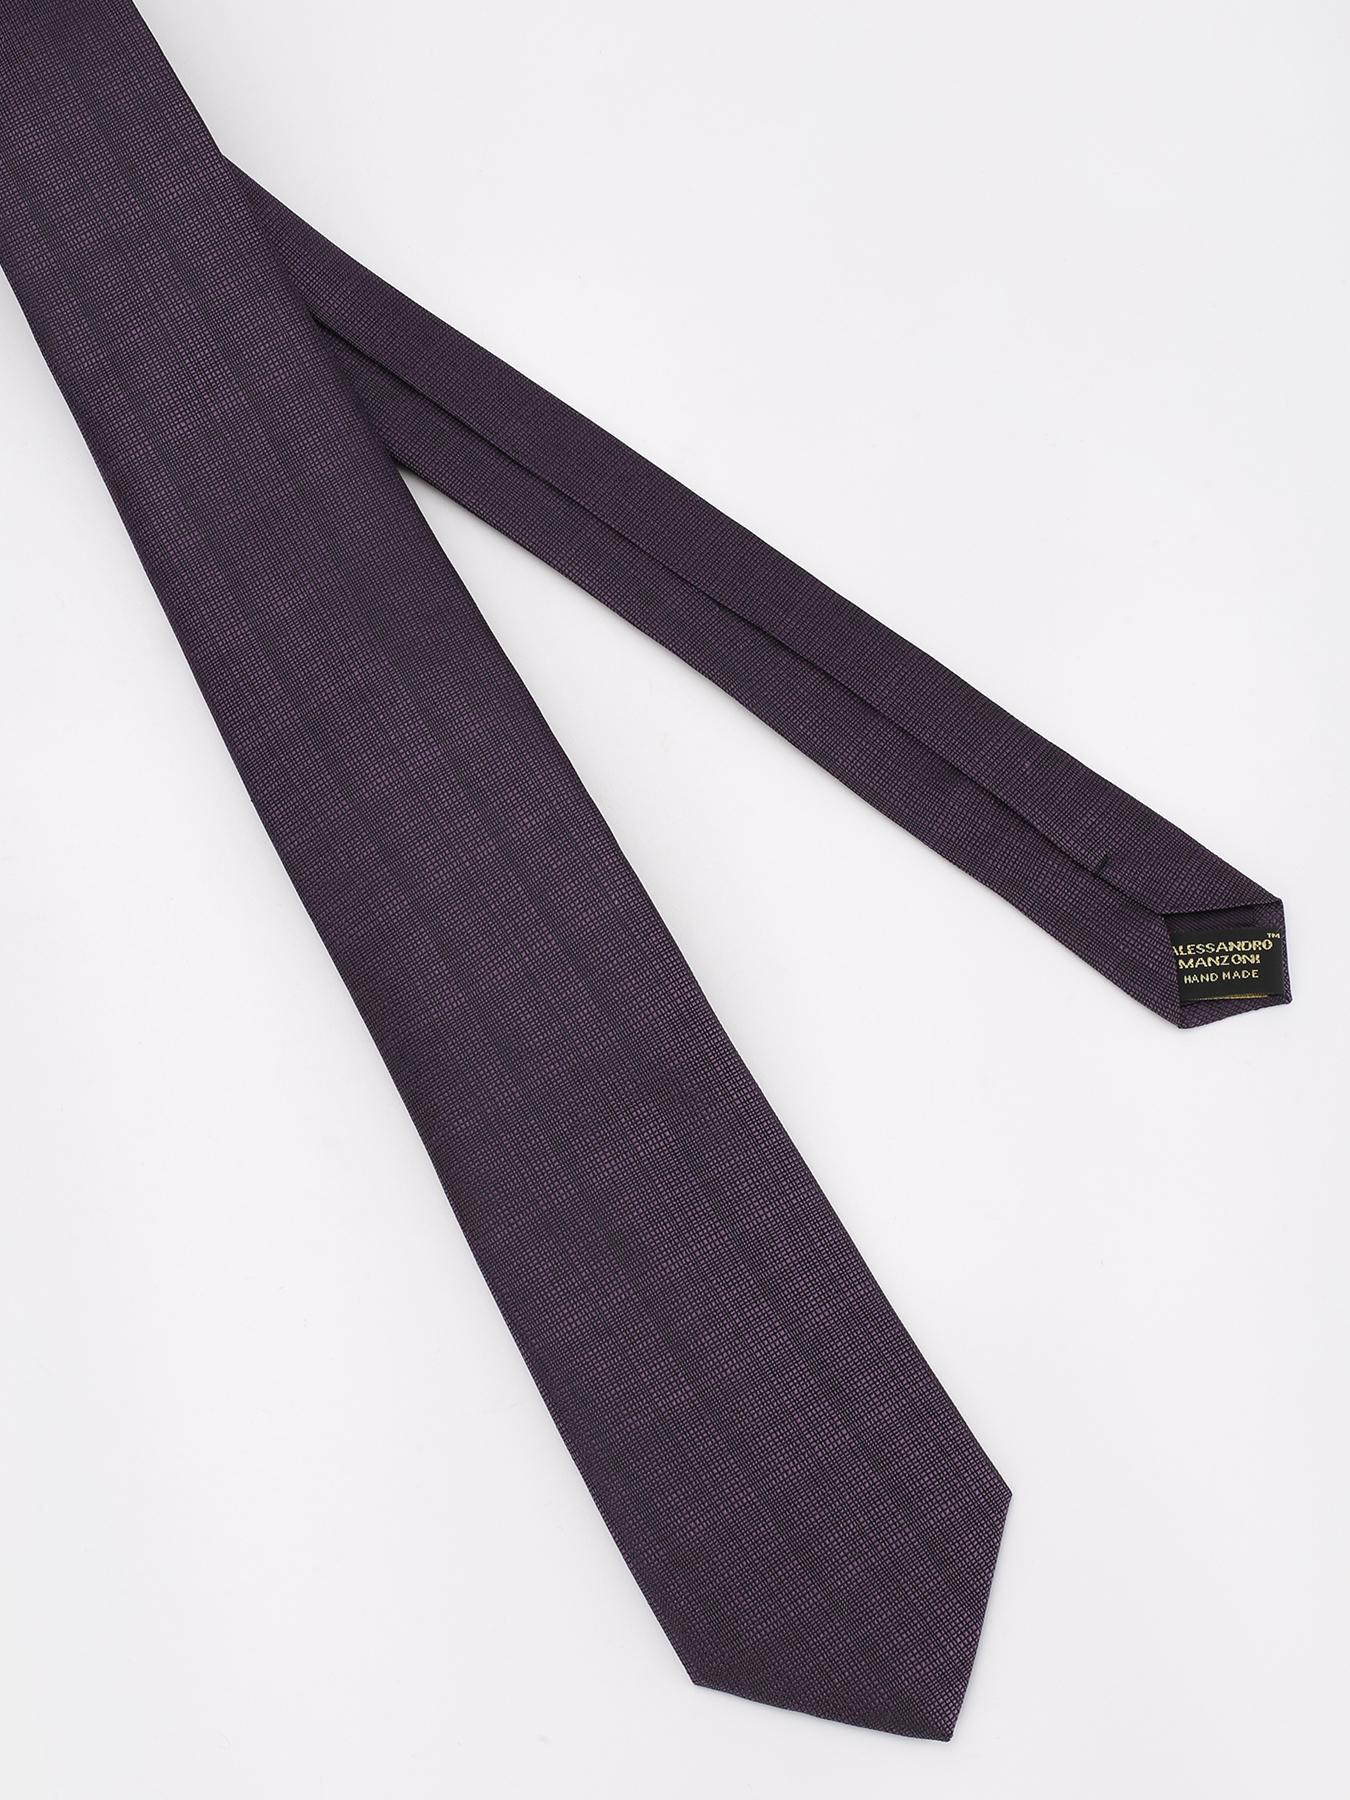 Alessandro Manzoni Шелковый галстук 312357-185 Фото 3